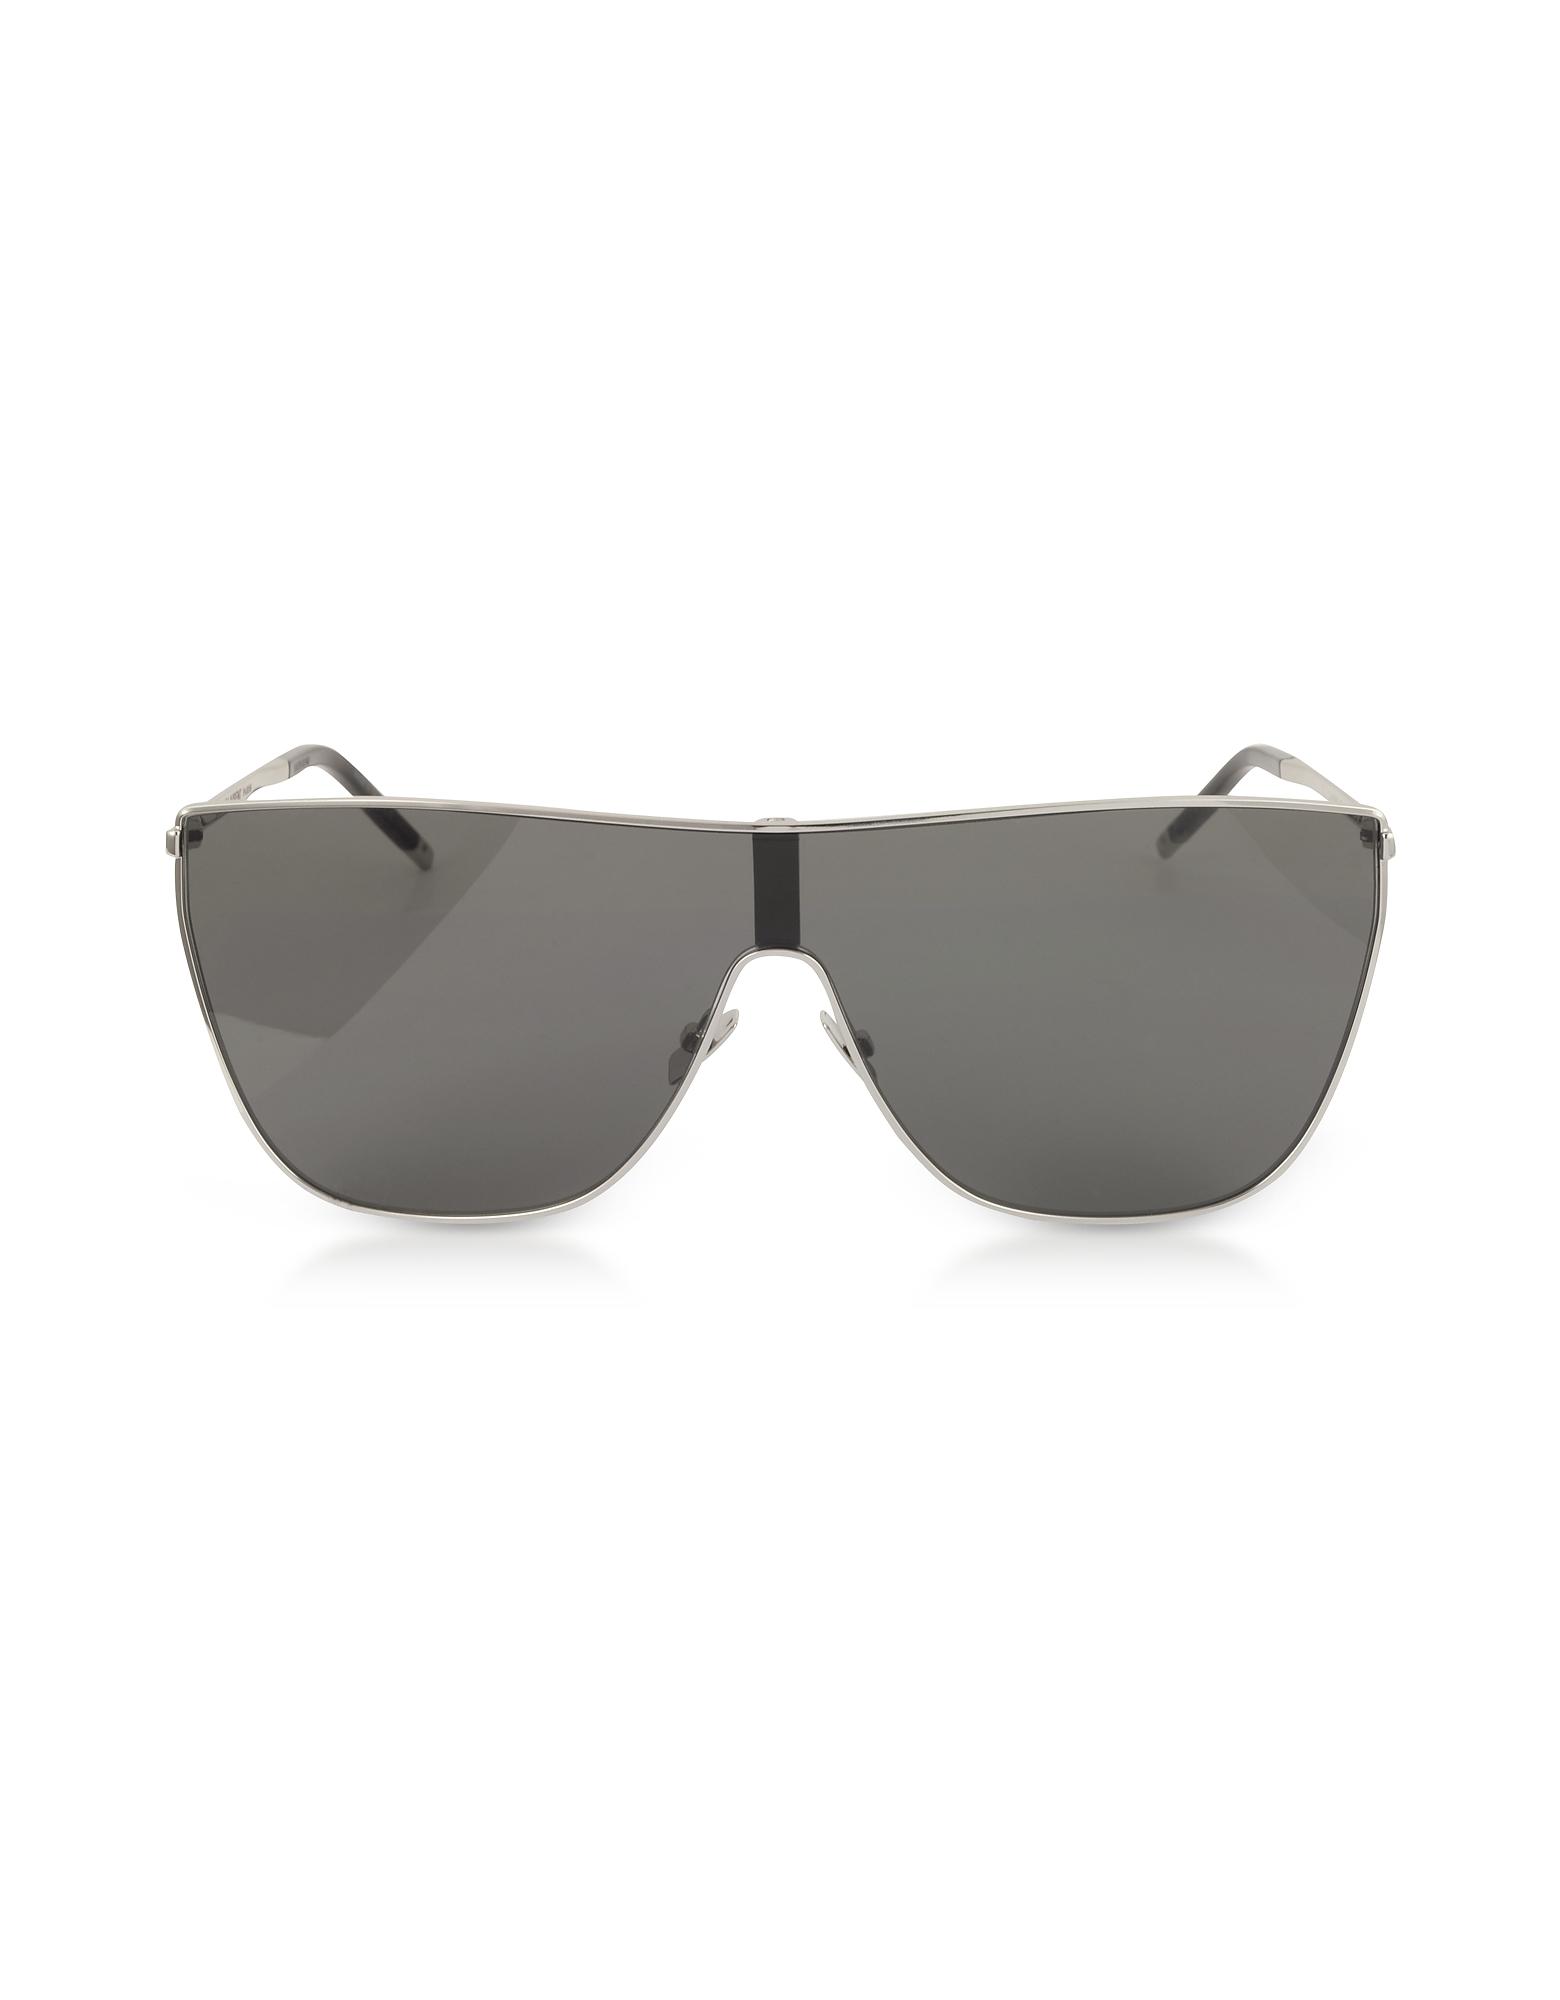 Saint Laurent Designer Sunglasses, SL1 MASK Metal Frame Men's Sunglasses